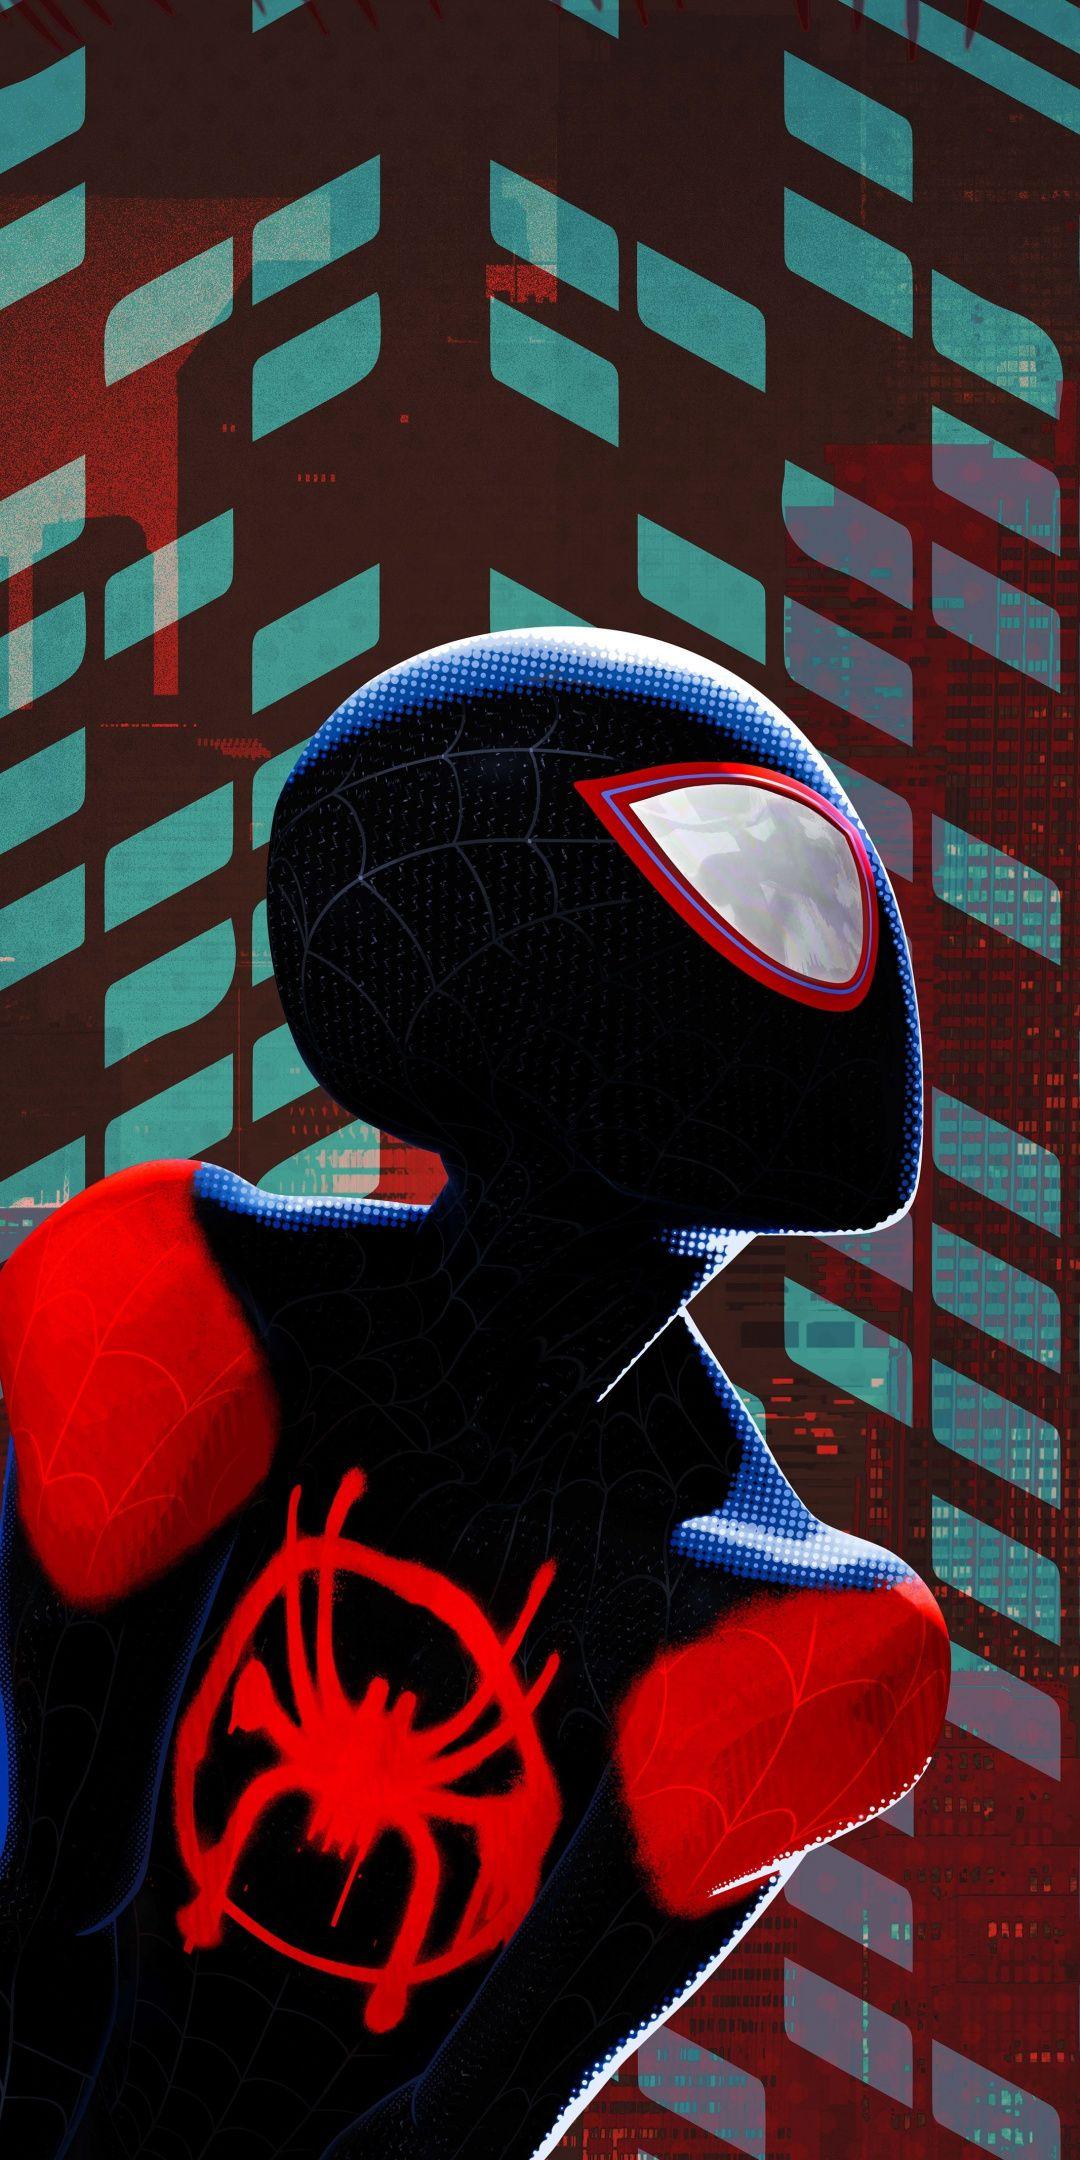 Miles Morales Black Suit Spider Man Into The Spider Verse 1080x2160 Wallpaper Spiderman Marvel Comics Wallpaper Spiderman Artwork